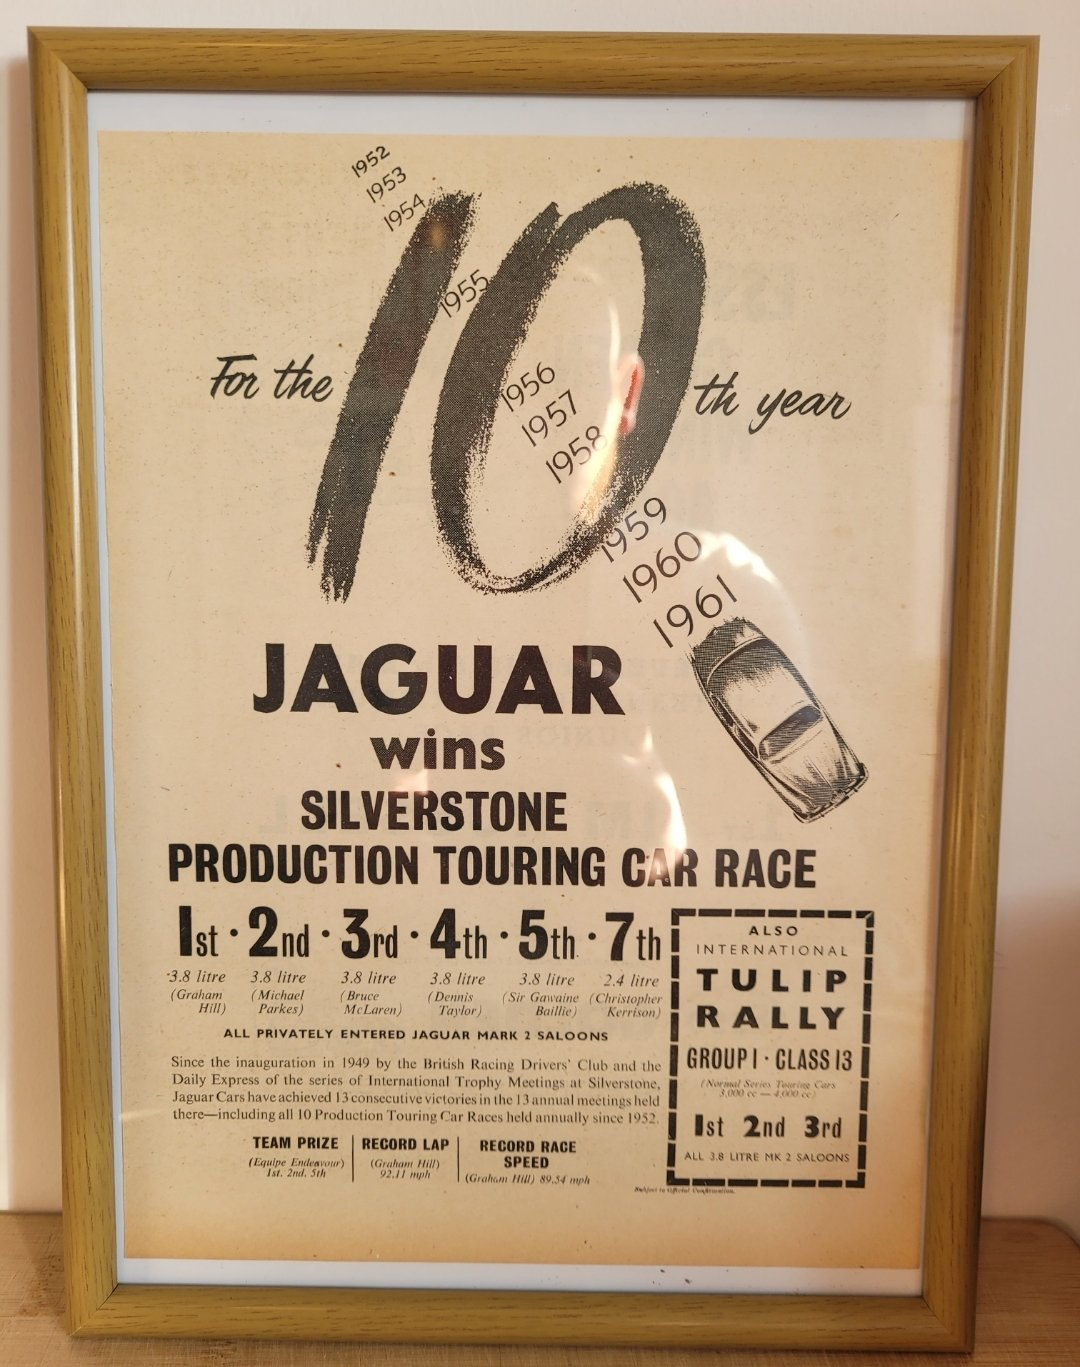 Original 1961 Jaguar Mark 2 Framed Advert